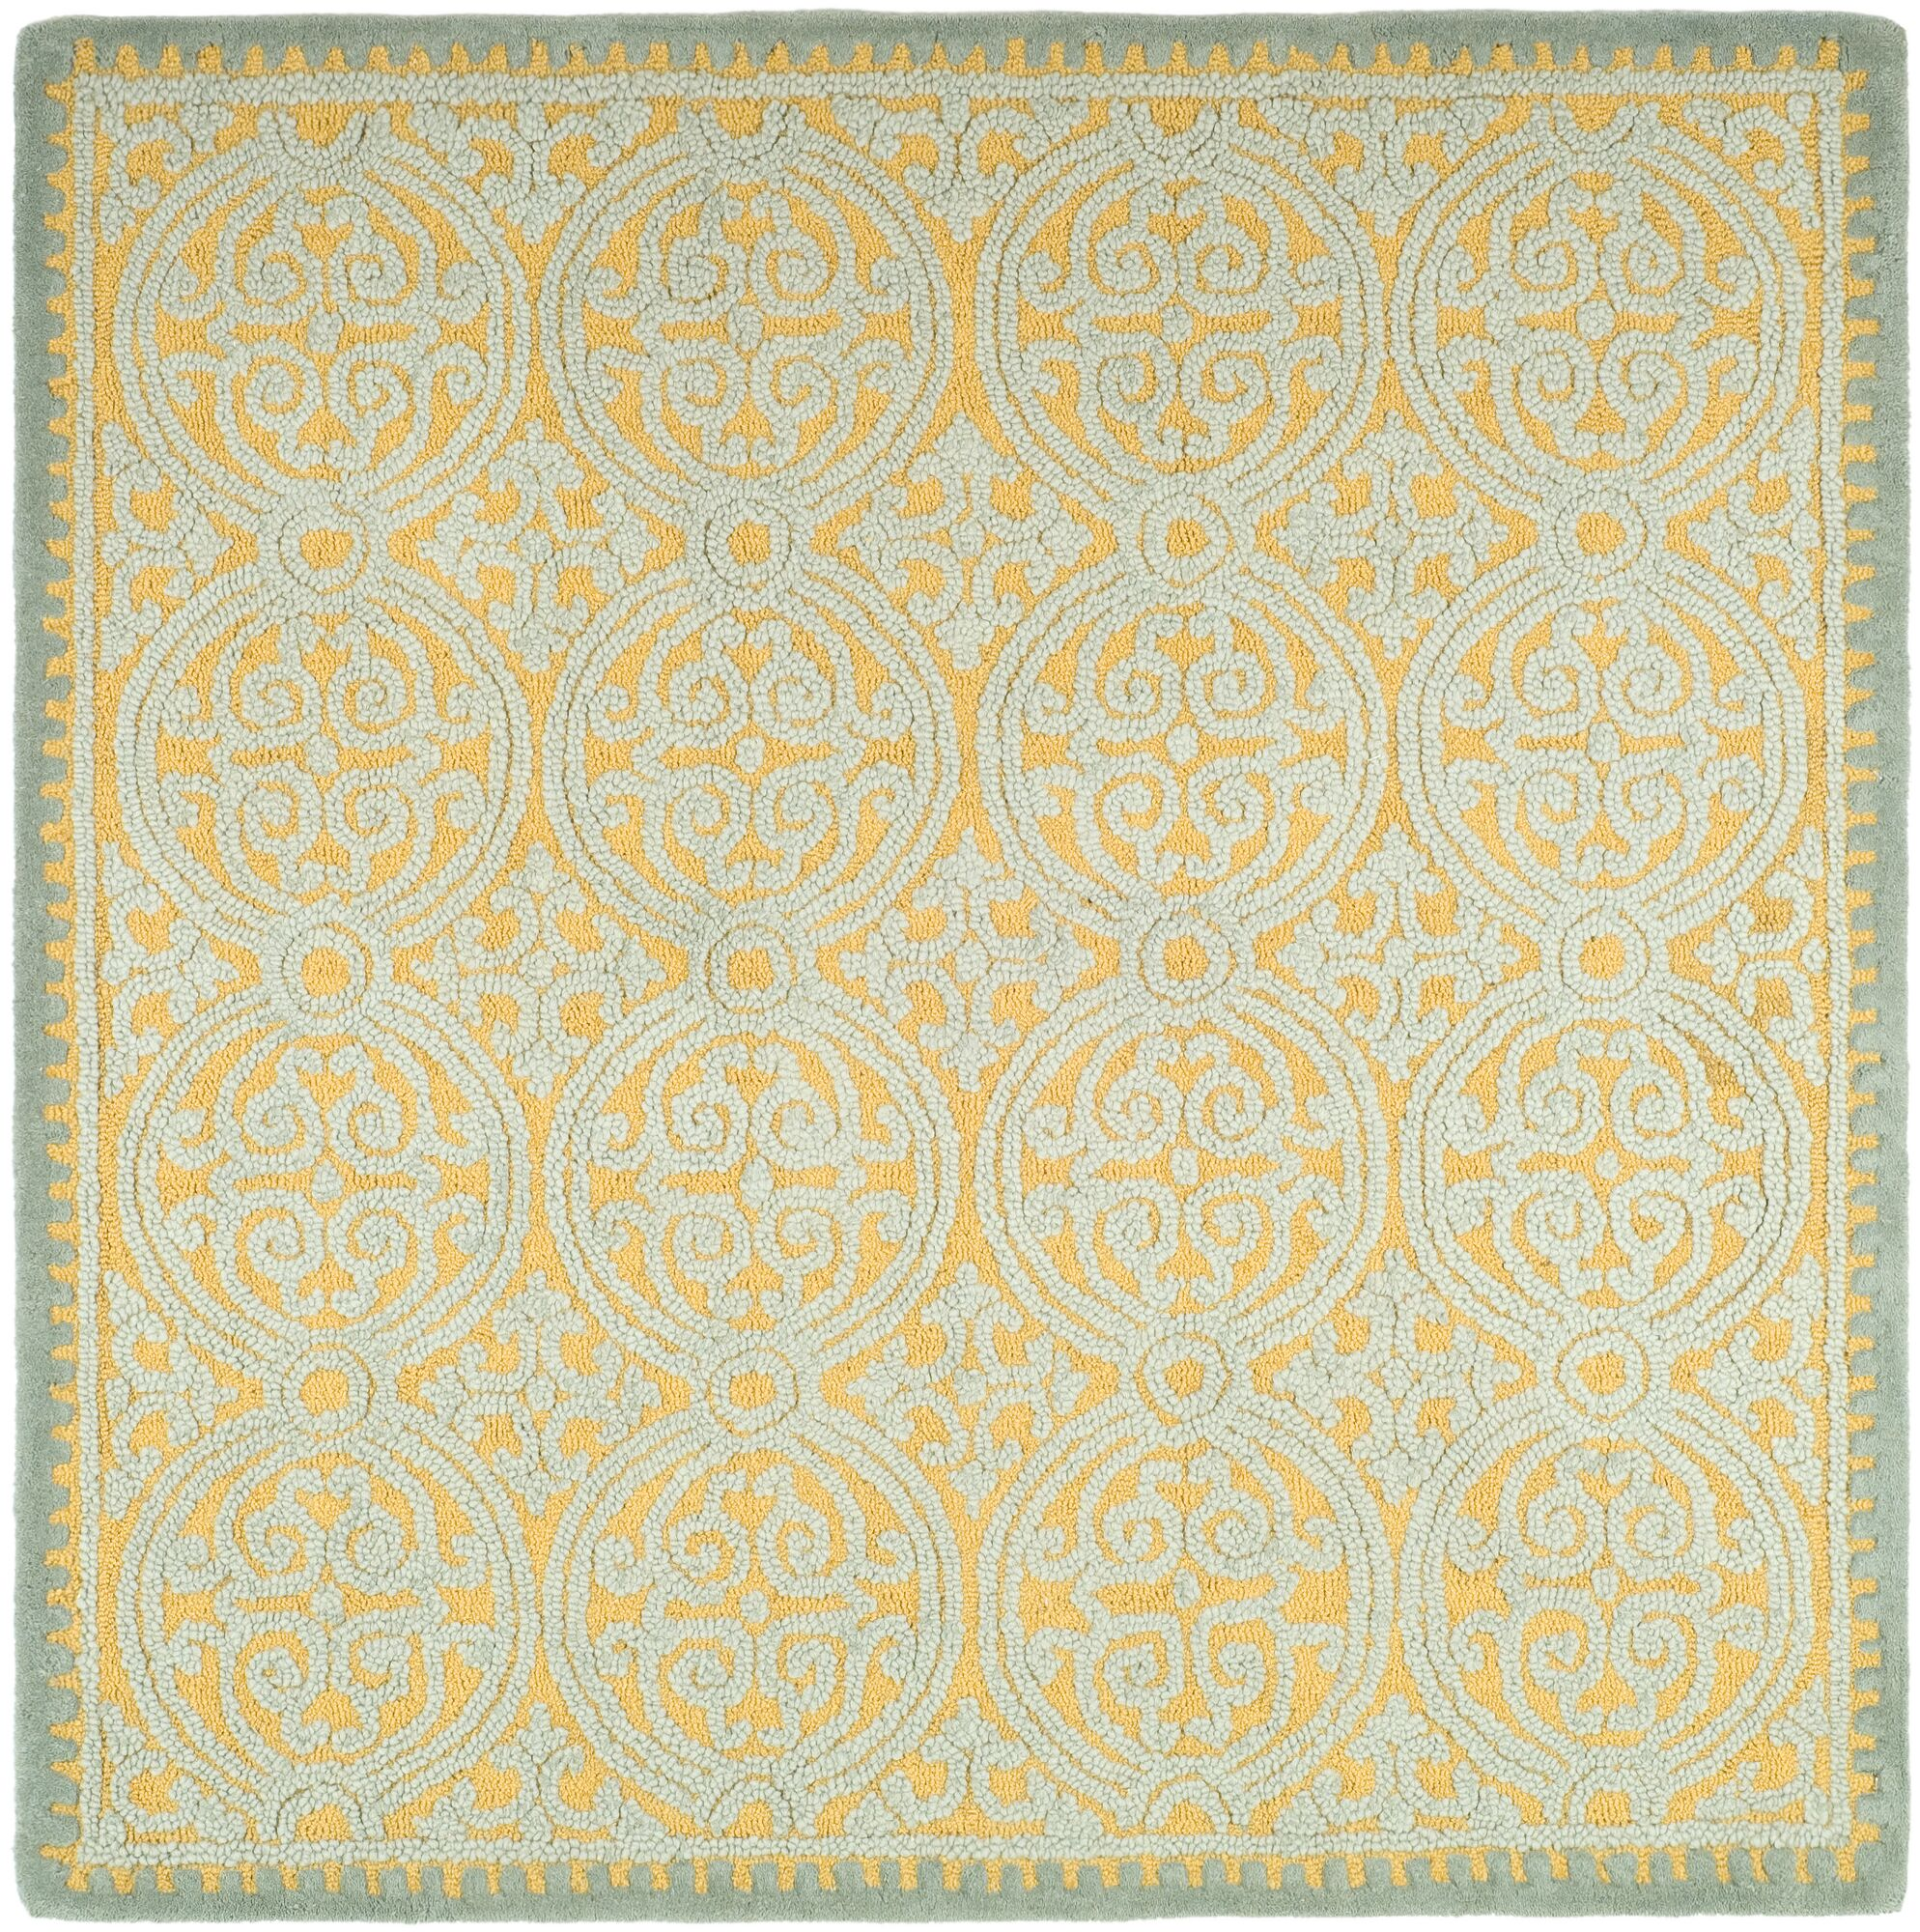 Charlenne Hand-Tufted Blue/Gold Area Rug Rug Size: Square 6'